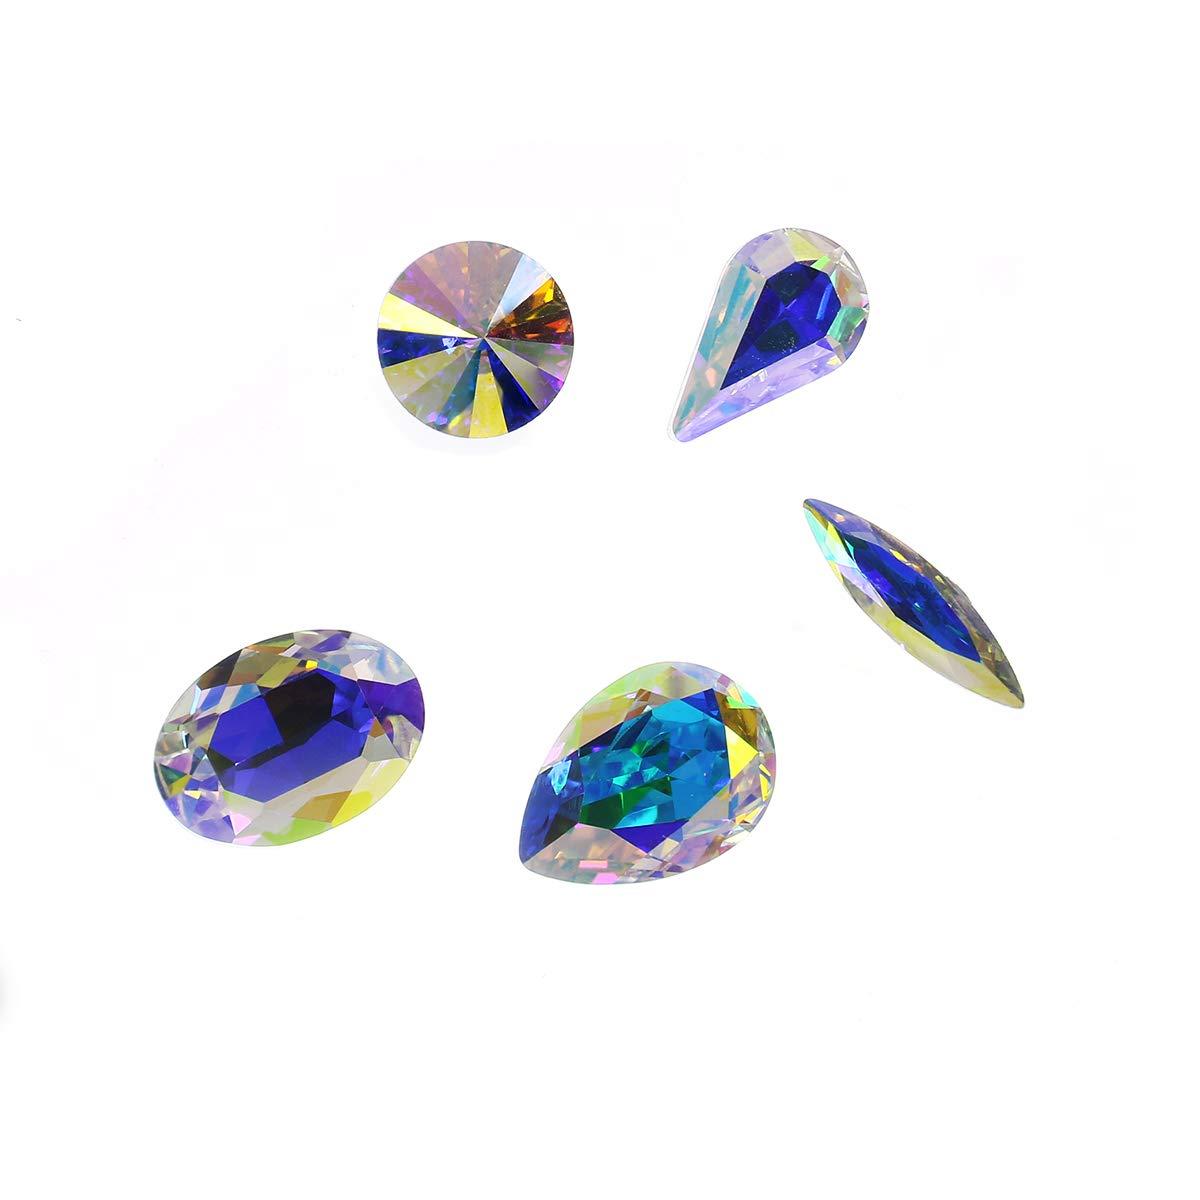 Mixed Shape Fluorescence Aquamarine Point Back Rhinestone Nail Art Beads Jewellery Making Glitter Glass Rhinestones Diy Nail Art Stones